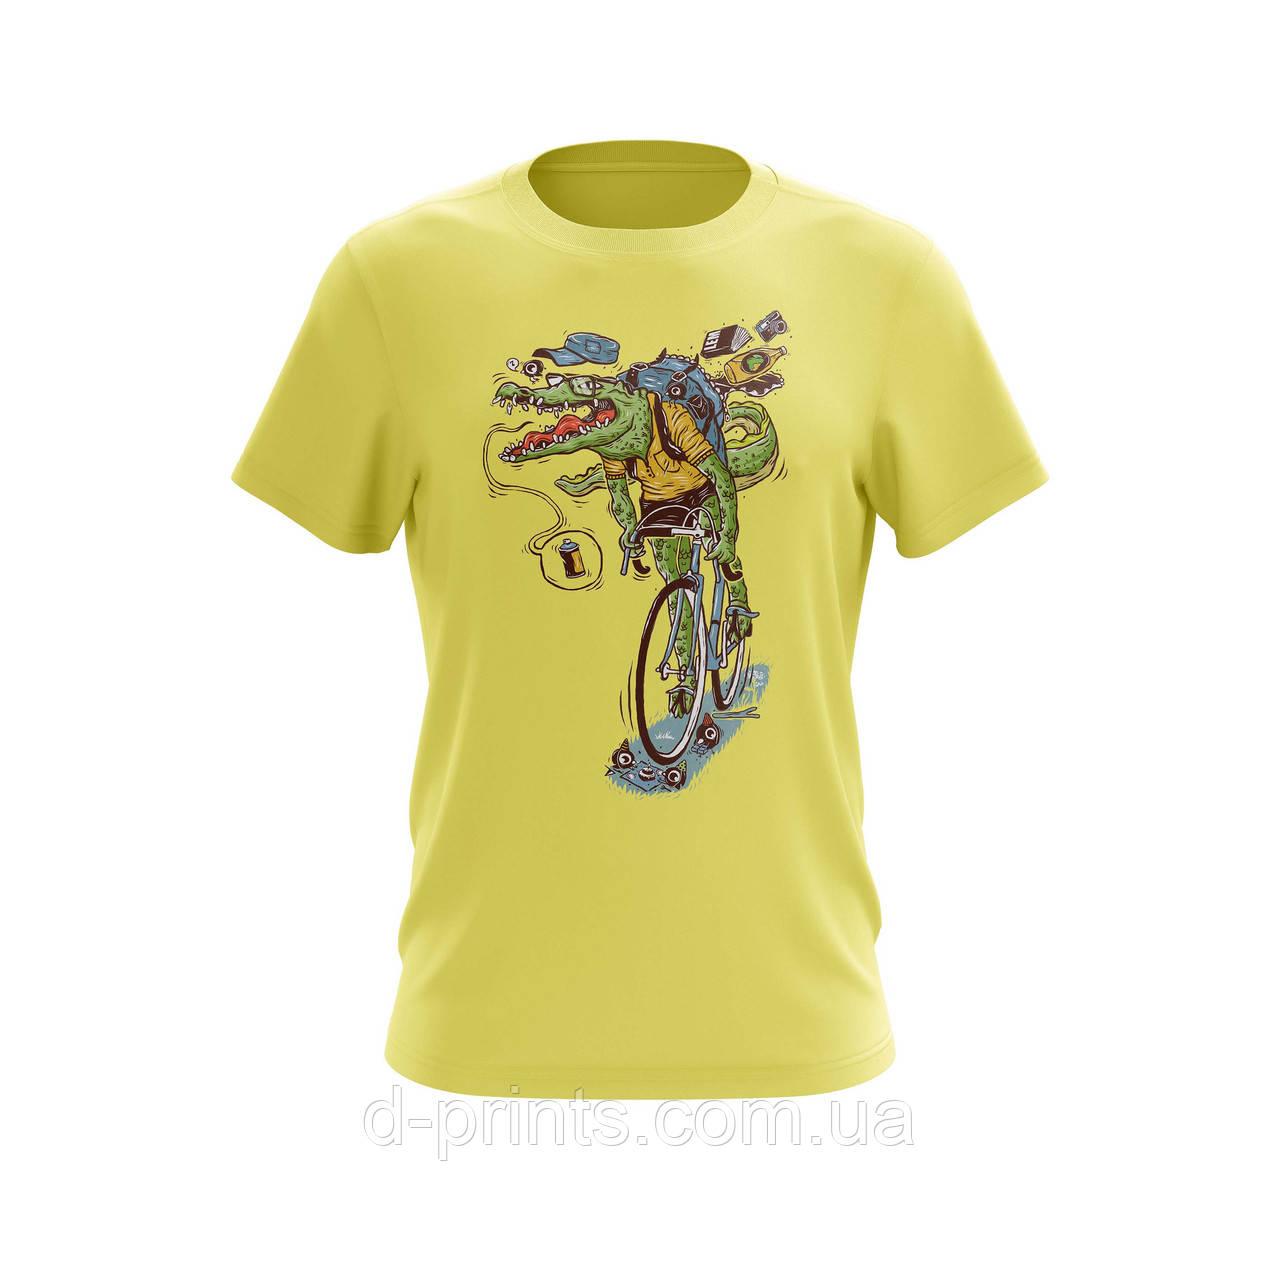 "Футболка мужская с рисунком ""Крокодил"" MF-12-09"